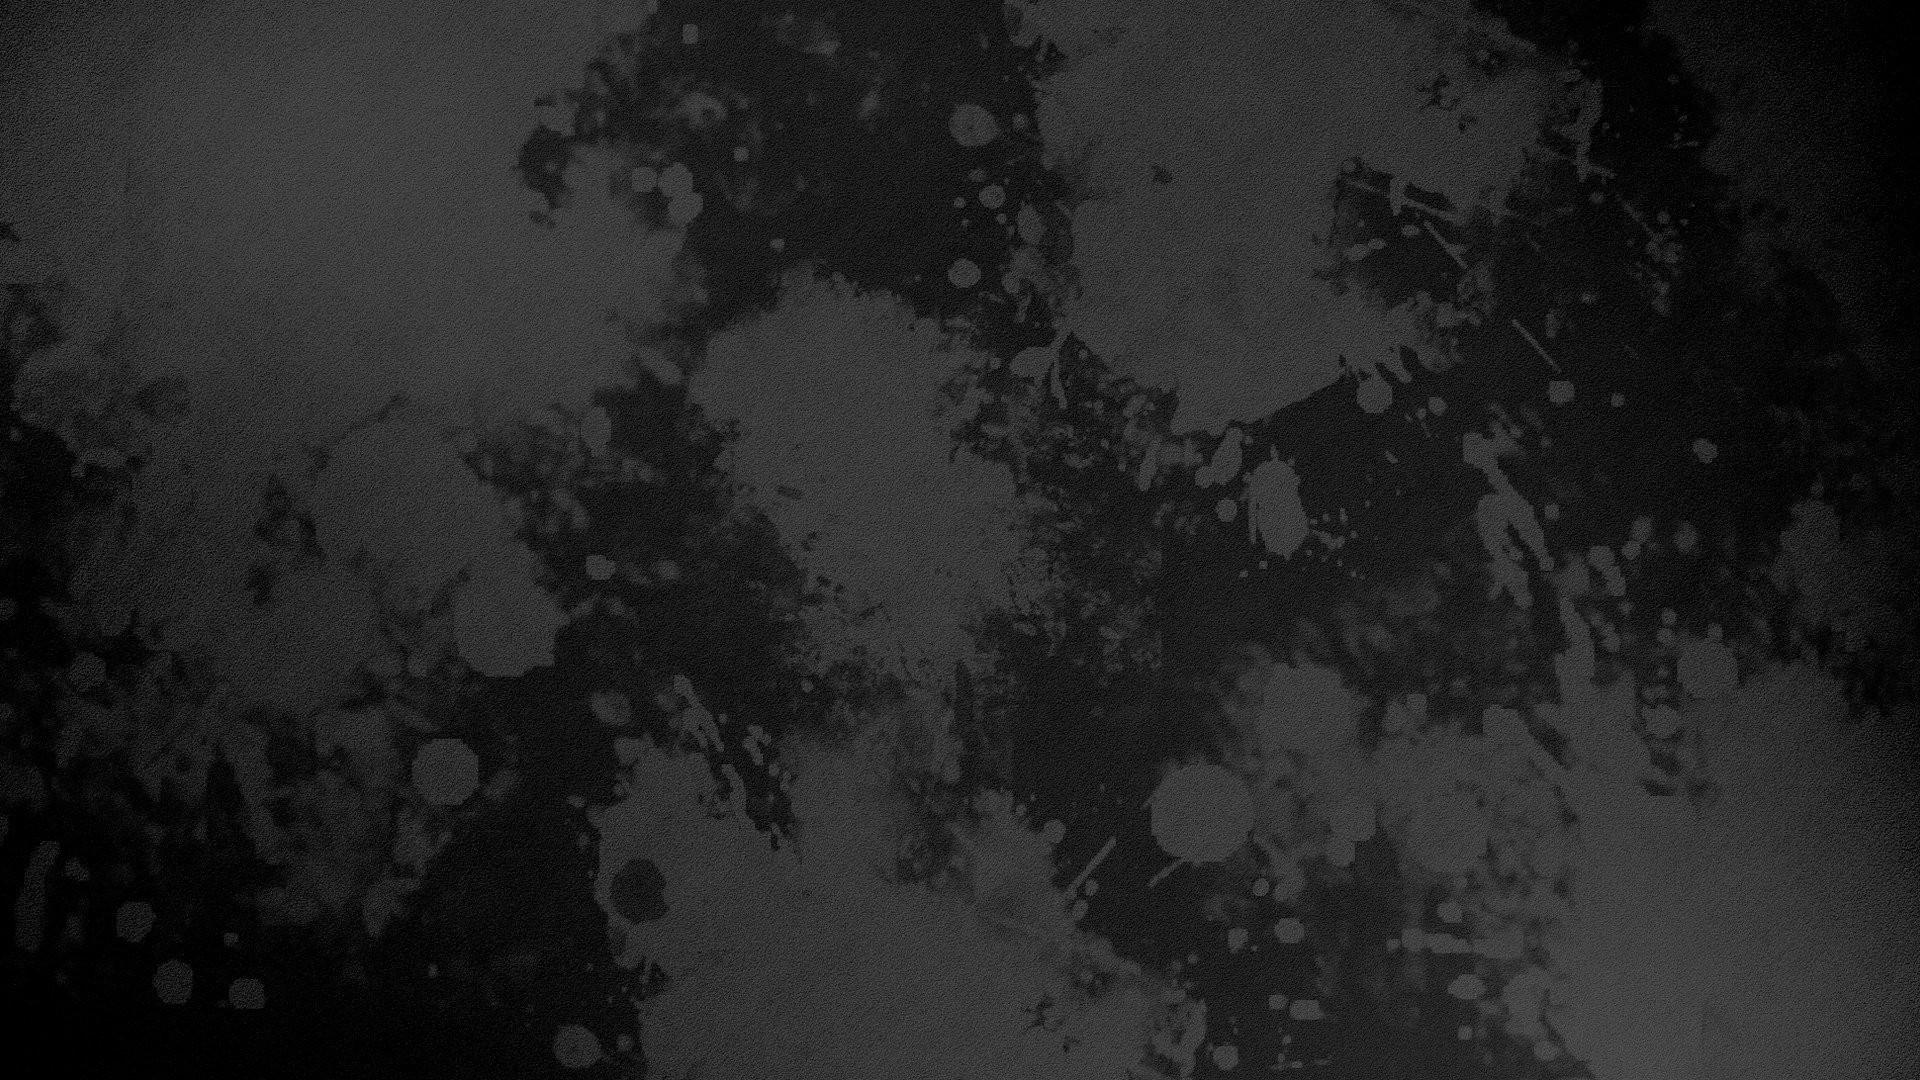 Pale grunge background tumblr download free amazing hd - White grunge background 1920x1080 ...